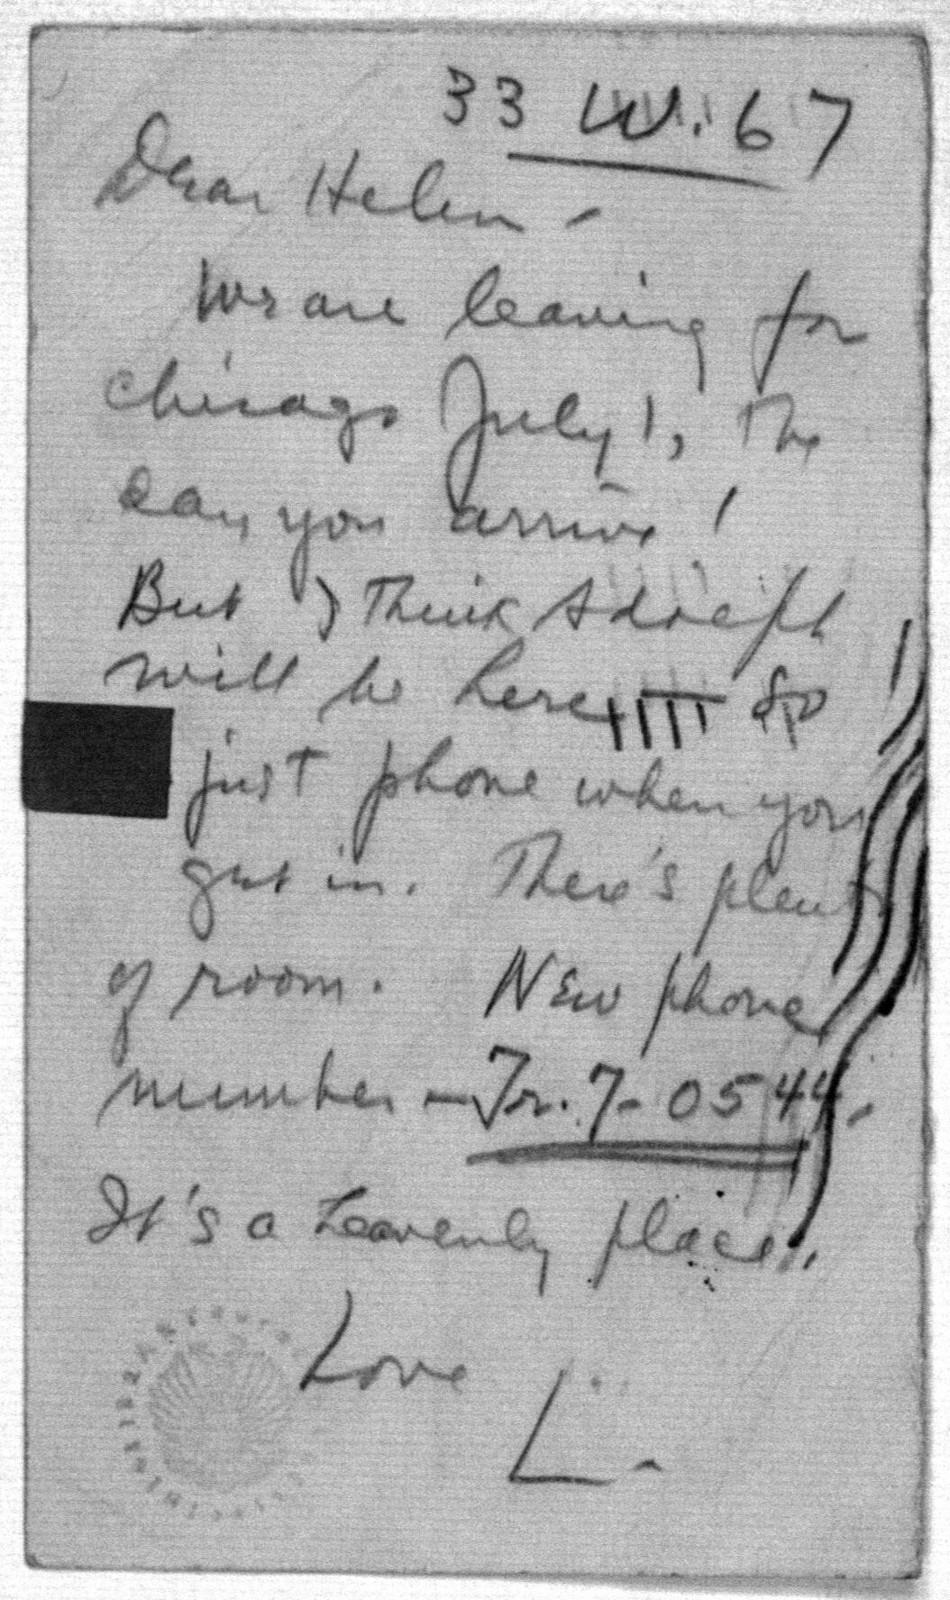 Letter from Leonard Bernstein to Helen Coates, 1944